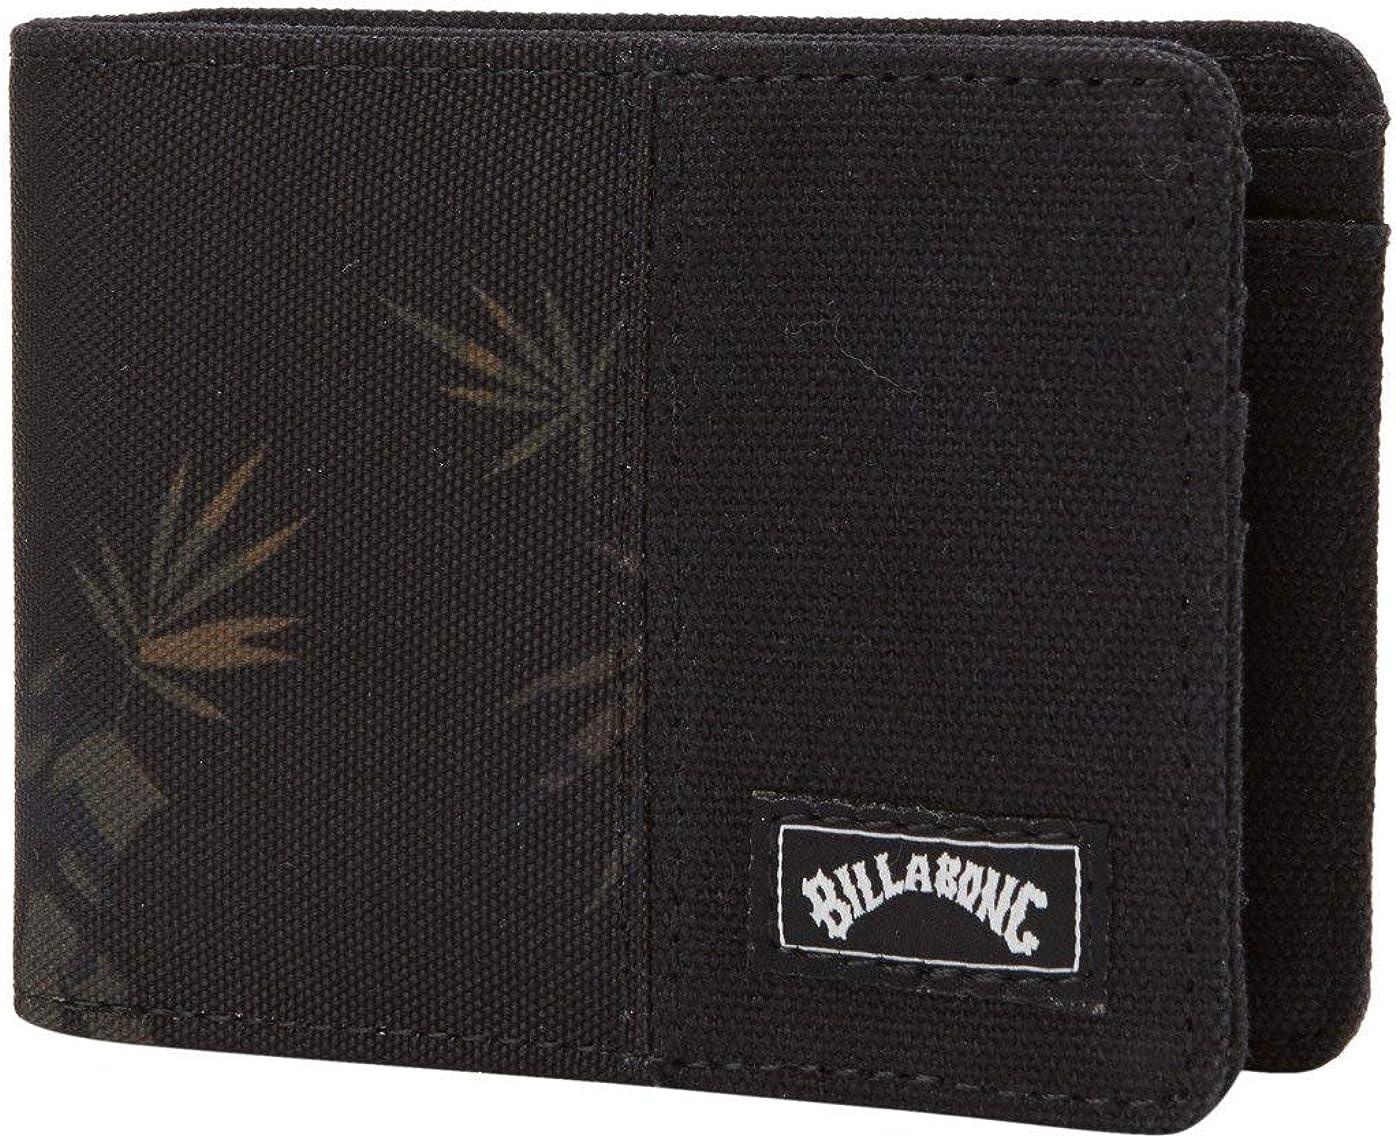 Billabong Tides Wallet - Military Camo